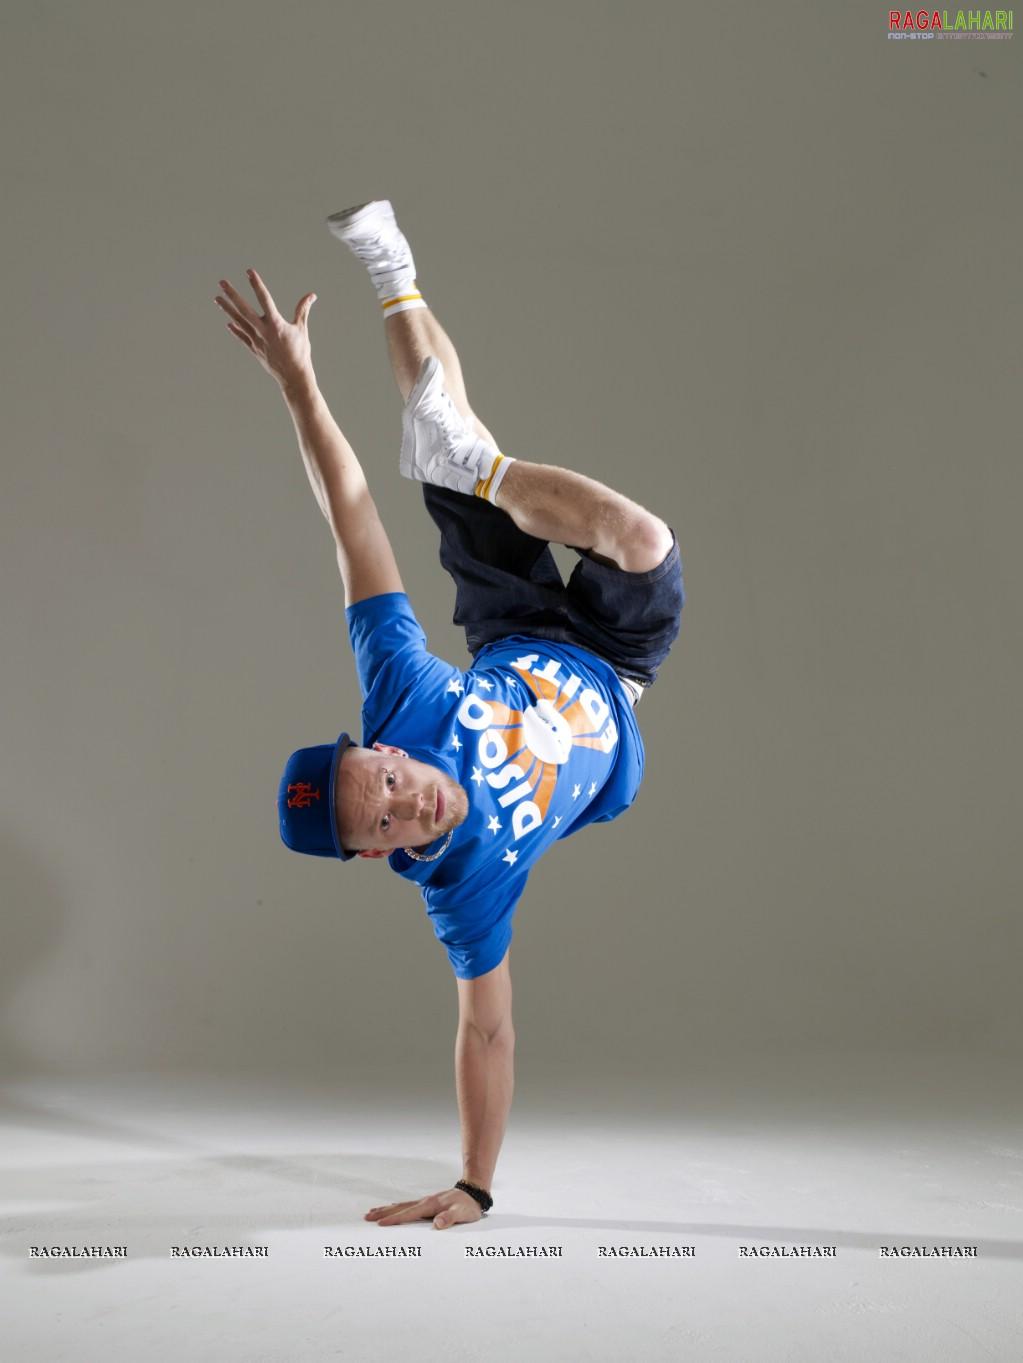 Wallpaper World: Amazing Street Dance Pictures